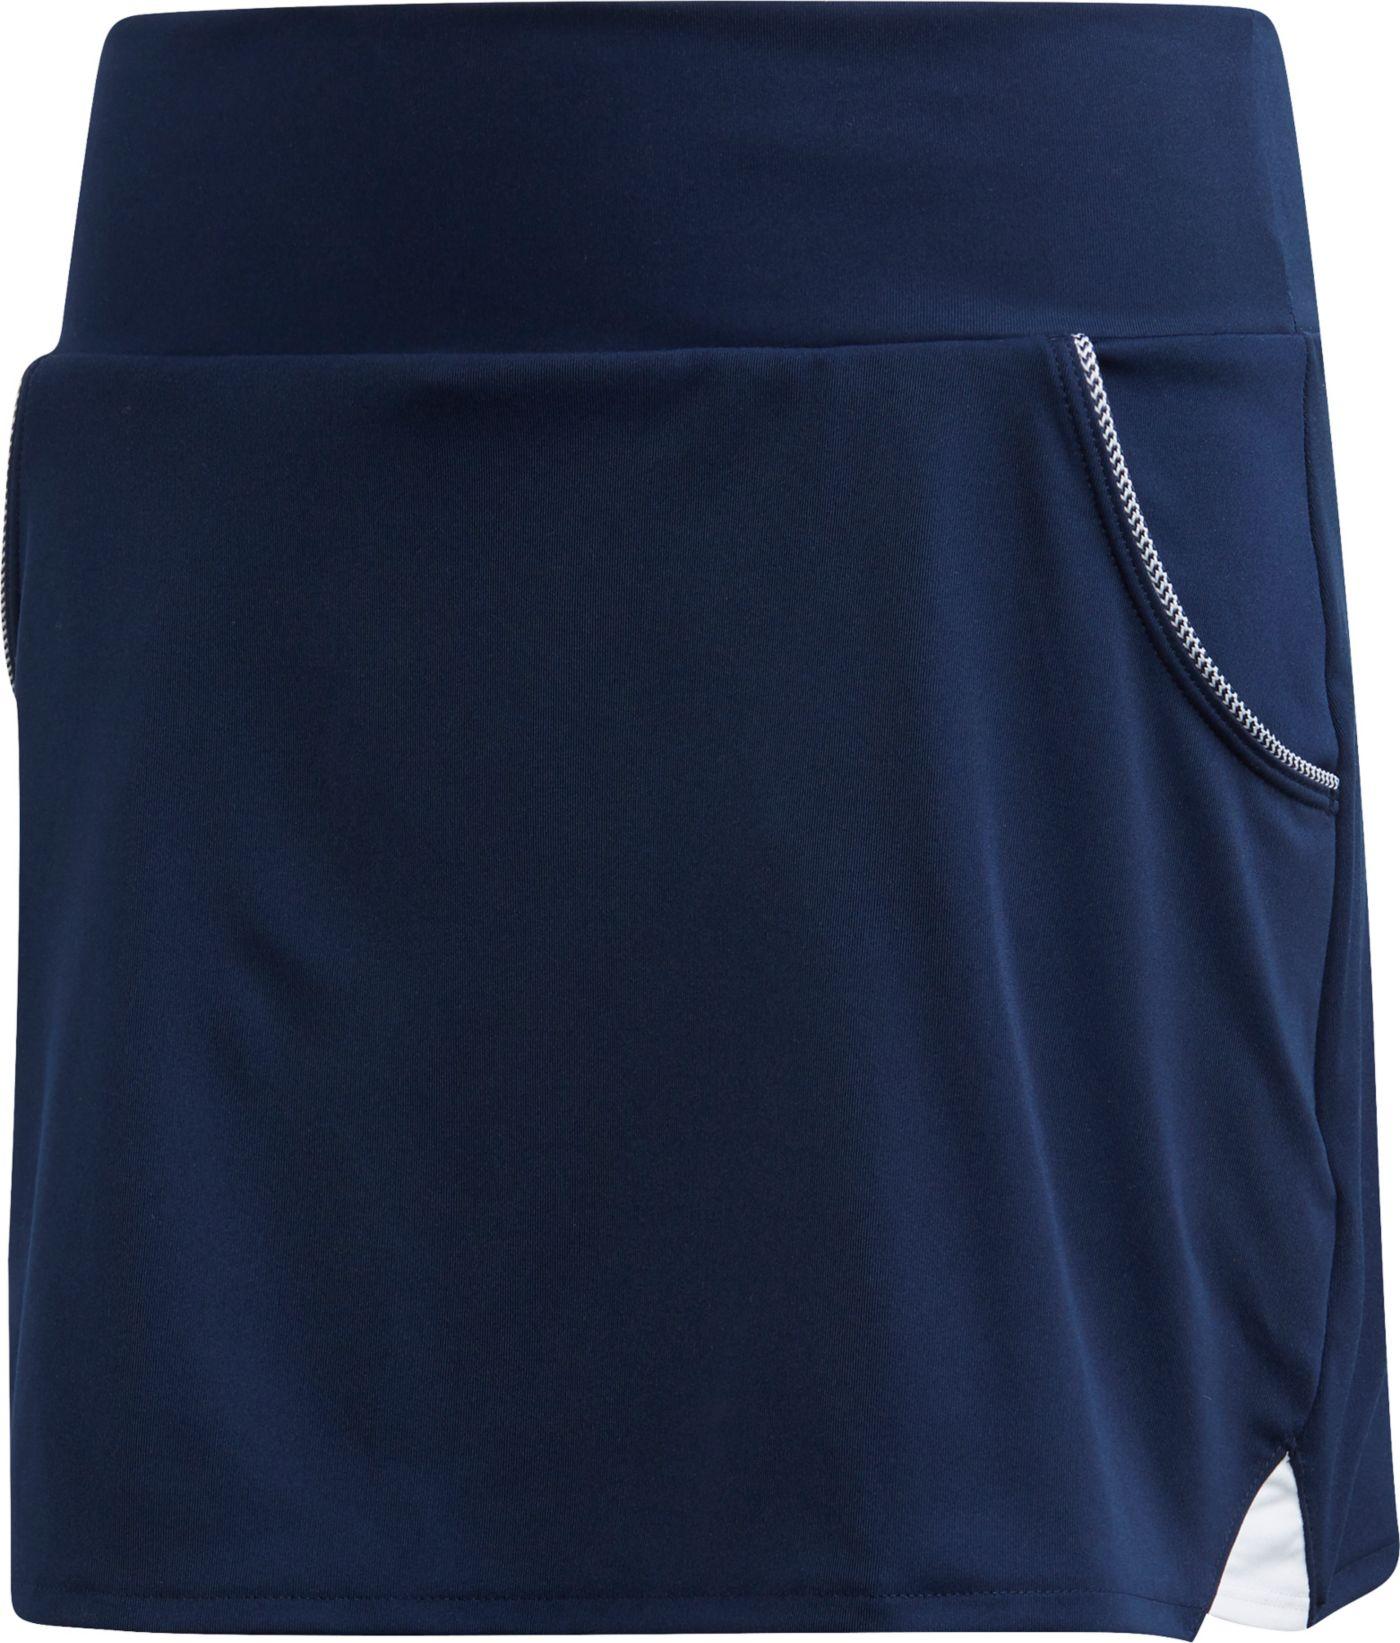 adidas Girls' Club Piped Pocket Tennis Skort